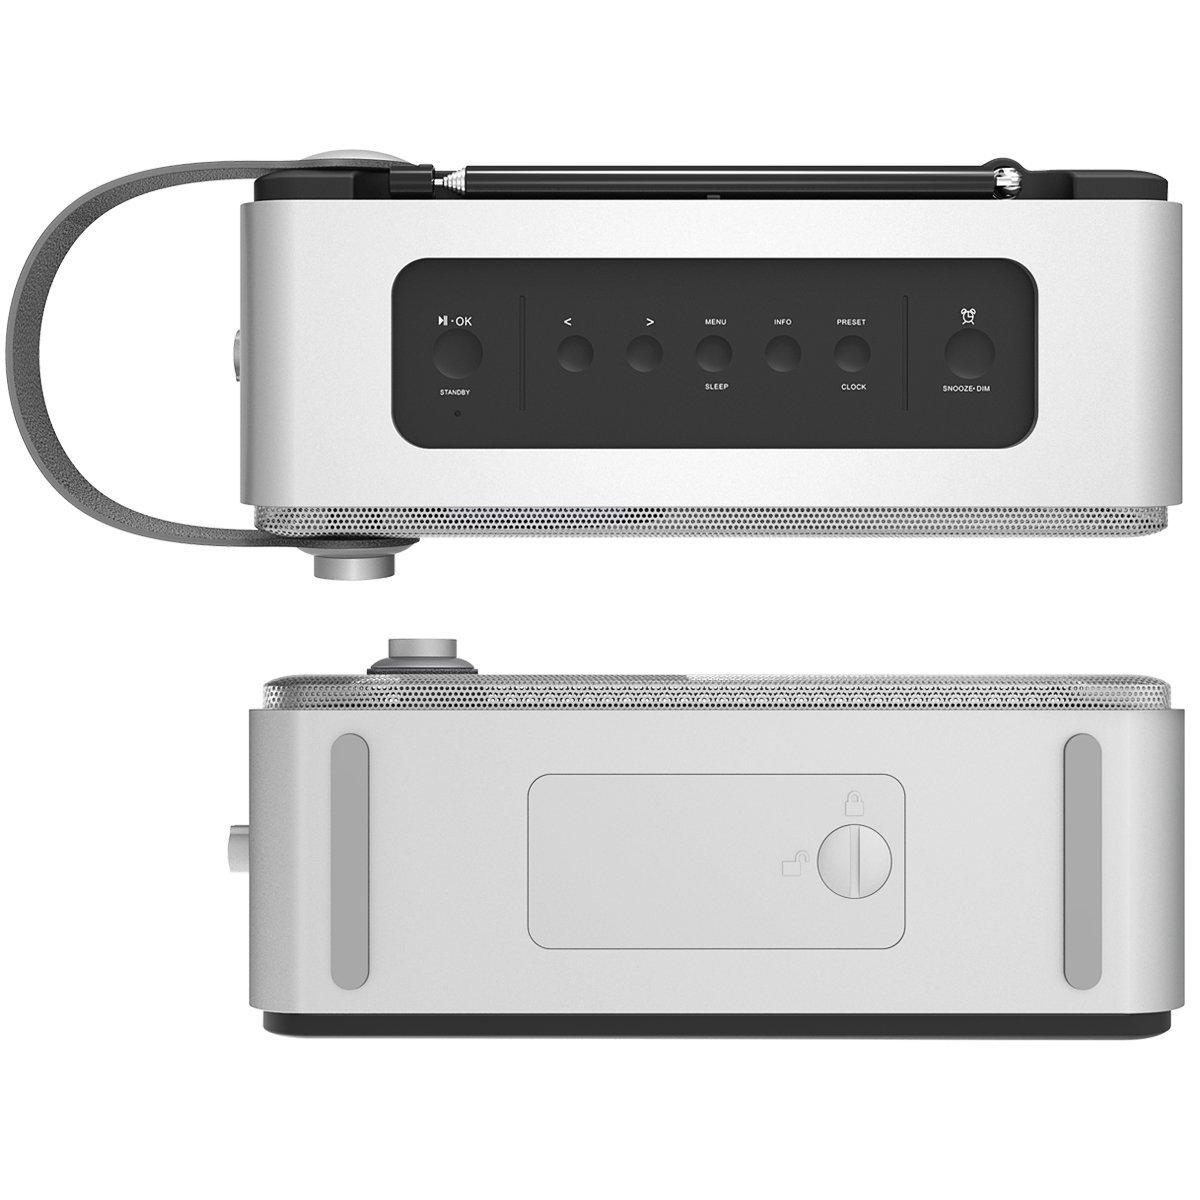 1byone DAB / FM Bluetooth Radio, Radio digital portátil con el despertador / FM / Pantalla LCD / 3.5mm Aux-in ,color plata & gris